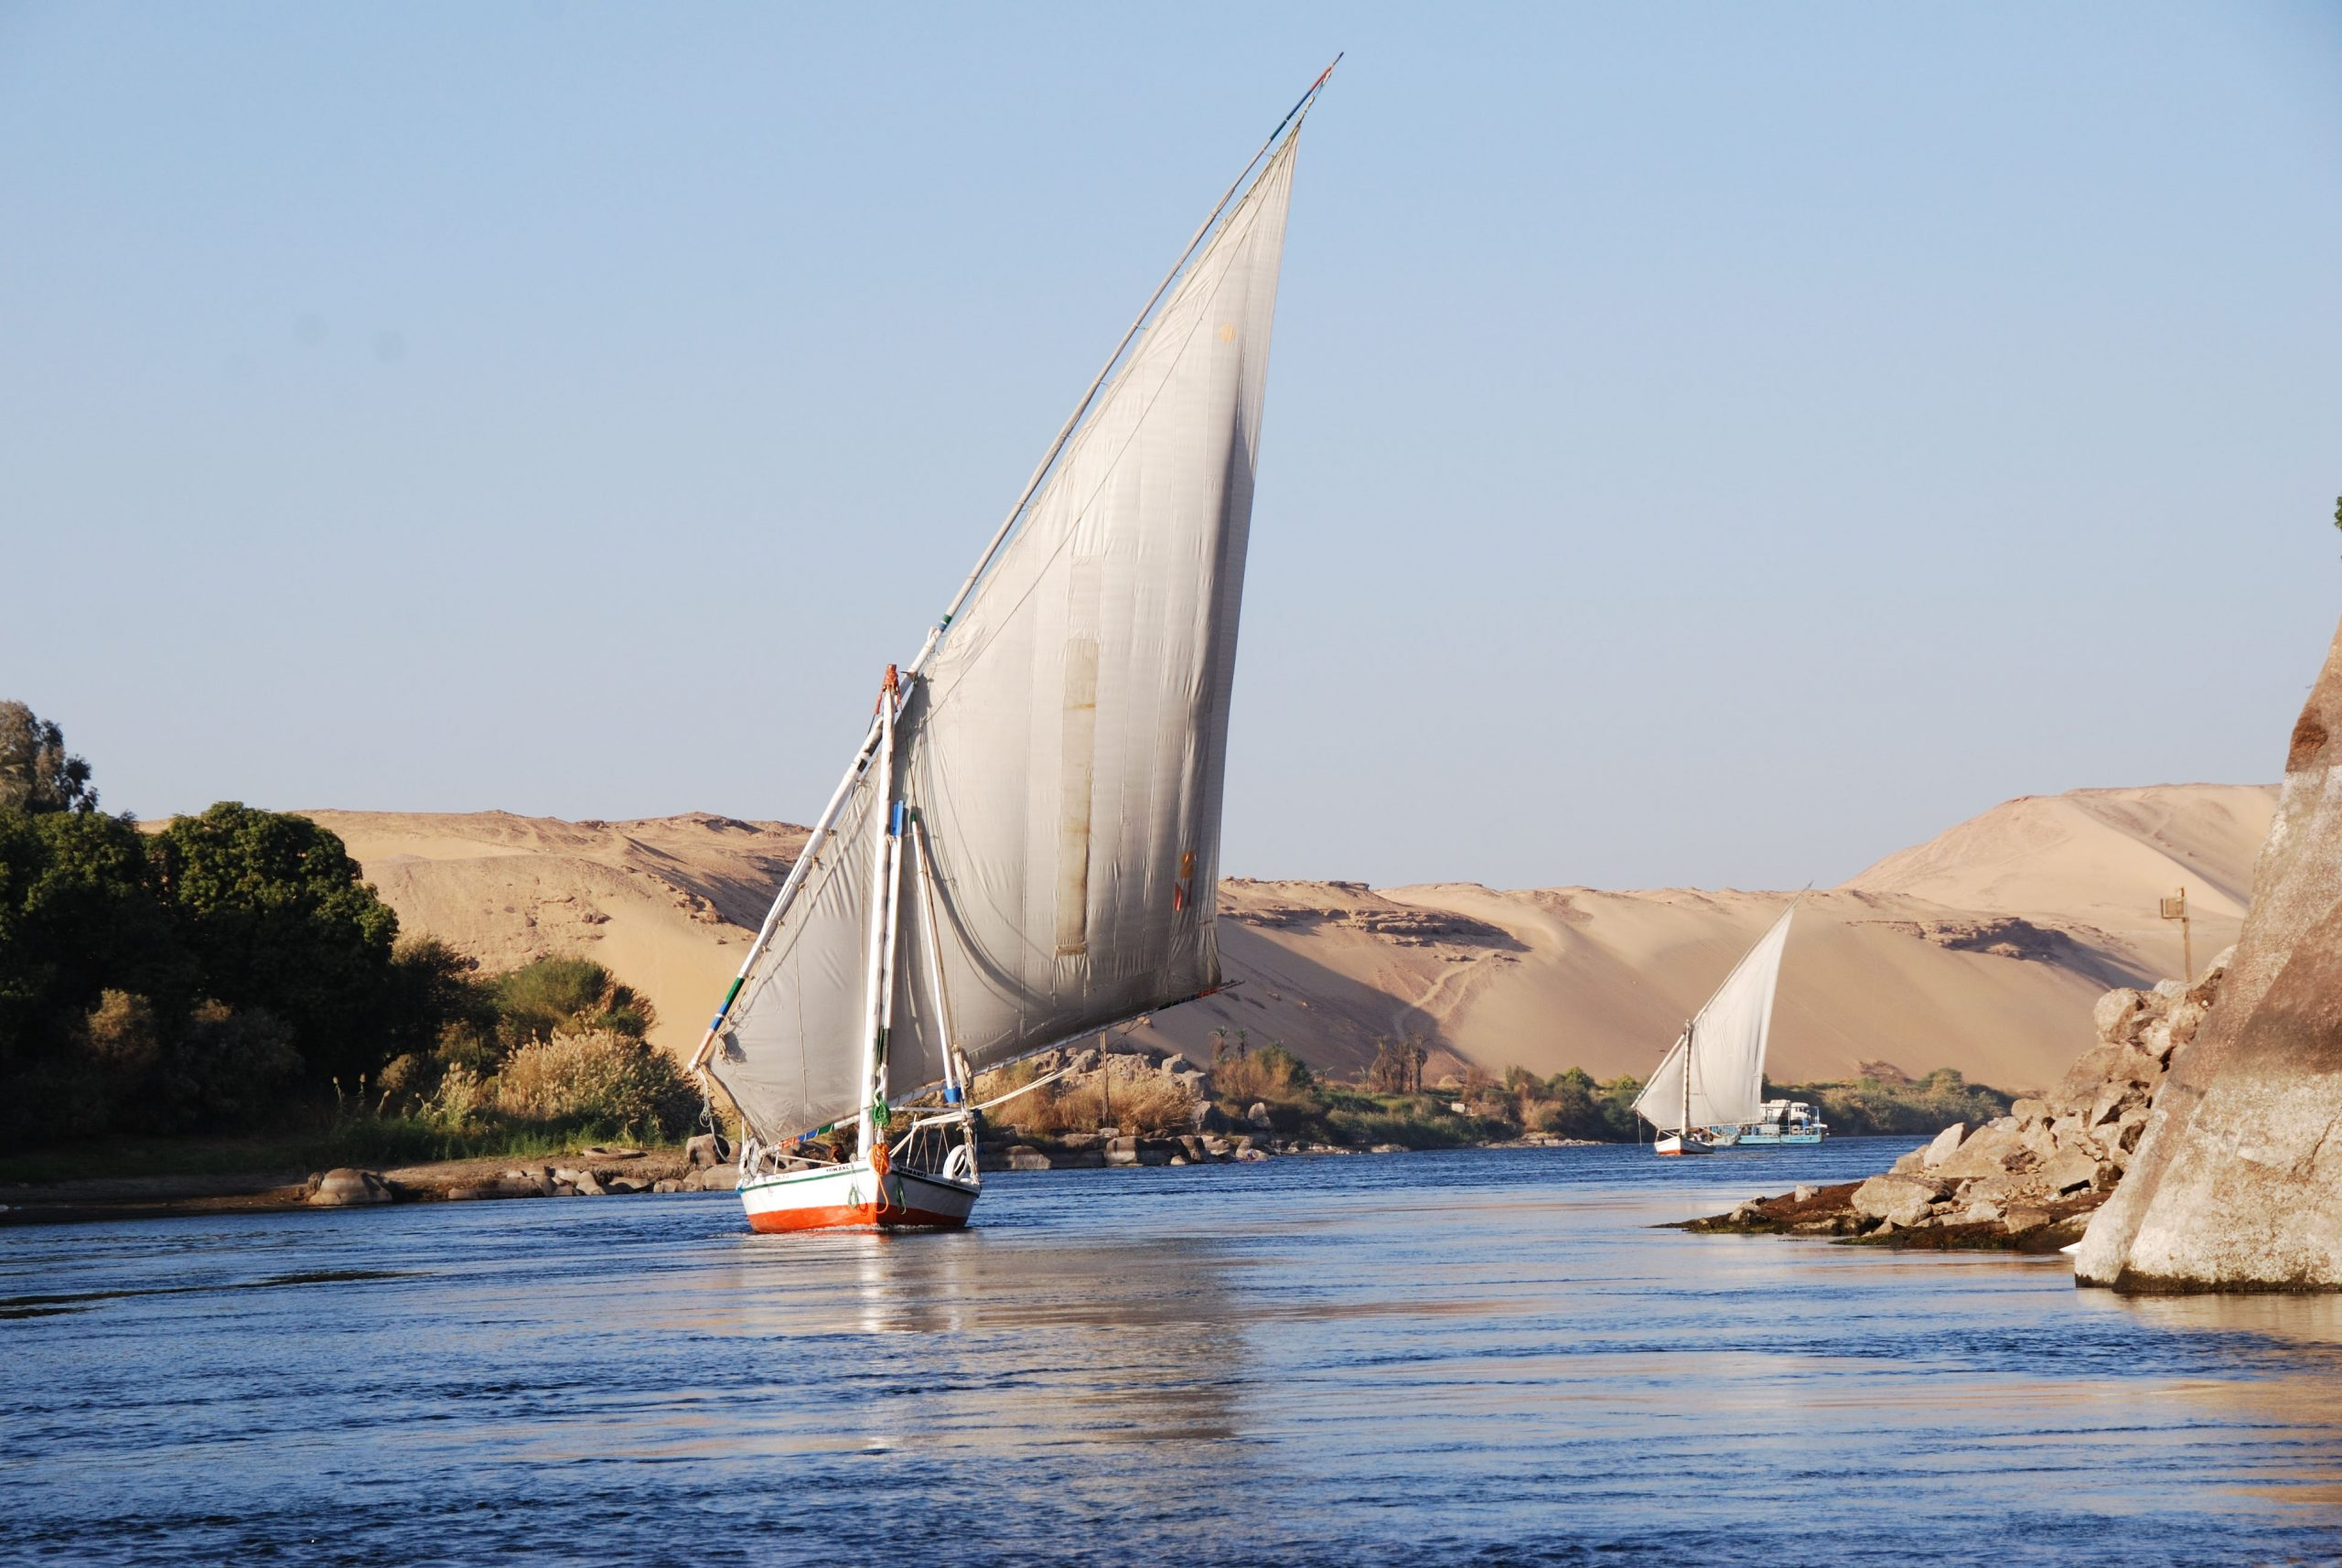 Viaje a Egipto - The Indiana Travel Experiences82